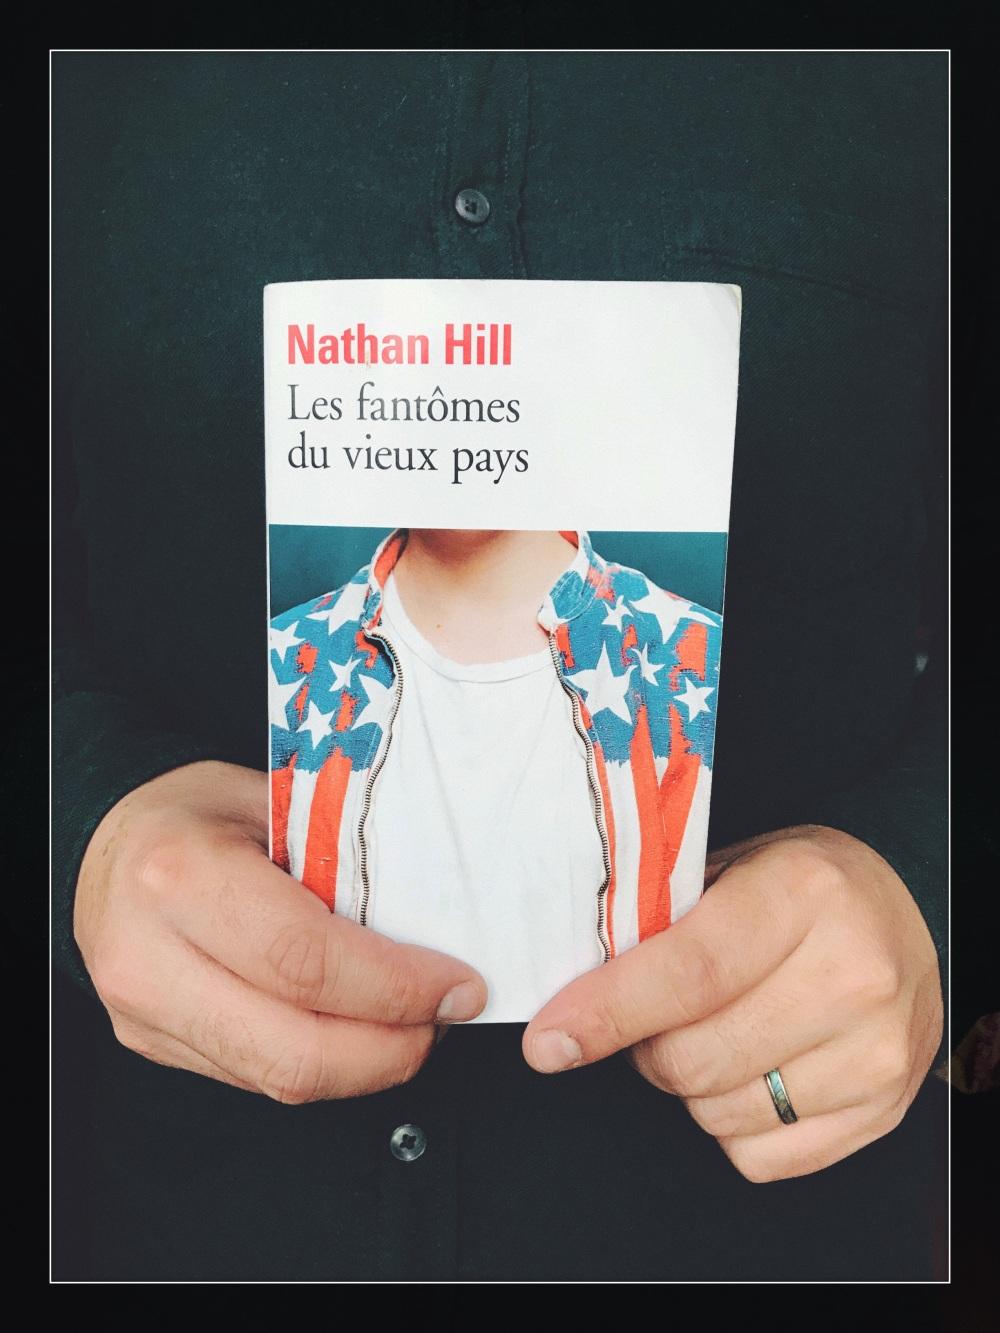 Les fantômes du vieux pays - Nathan Hill.JPG